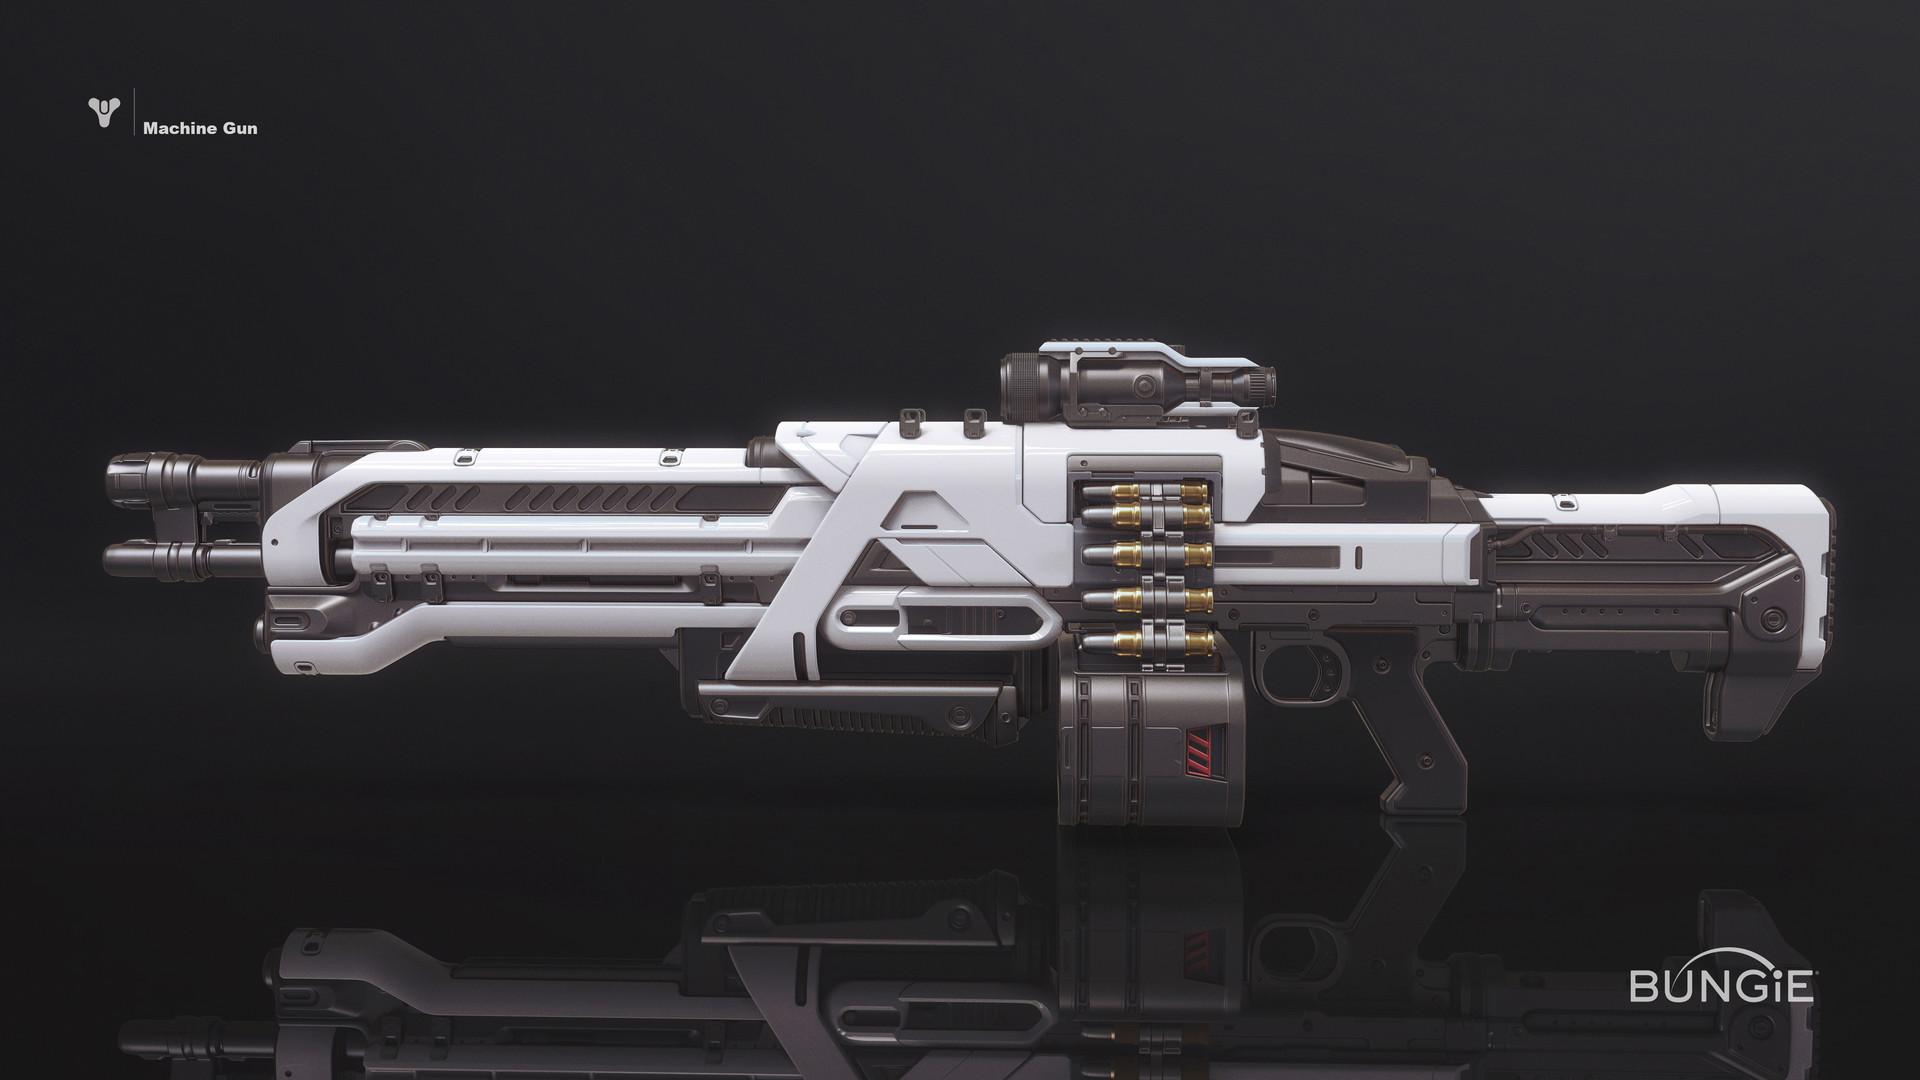 Mark van haitsma d1 machine gun 1d